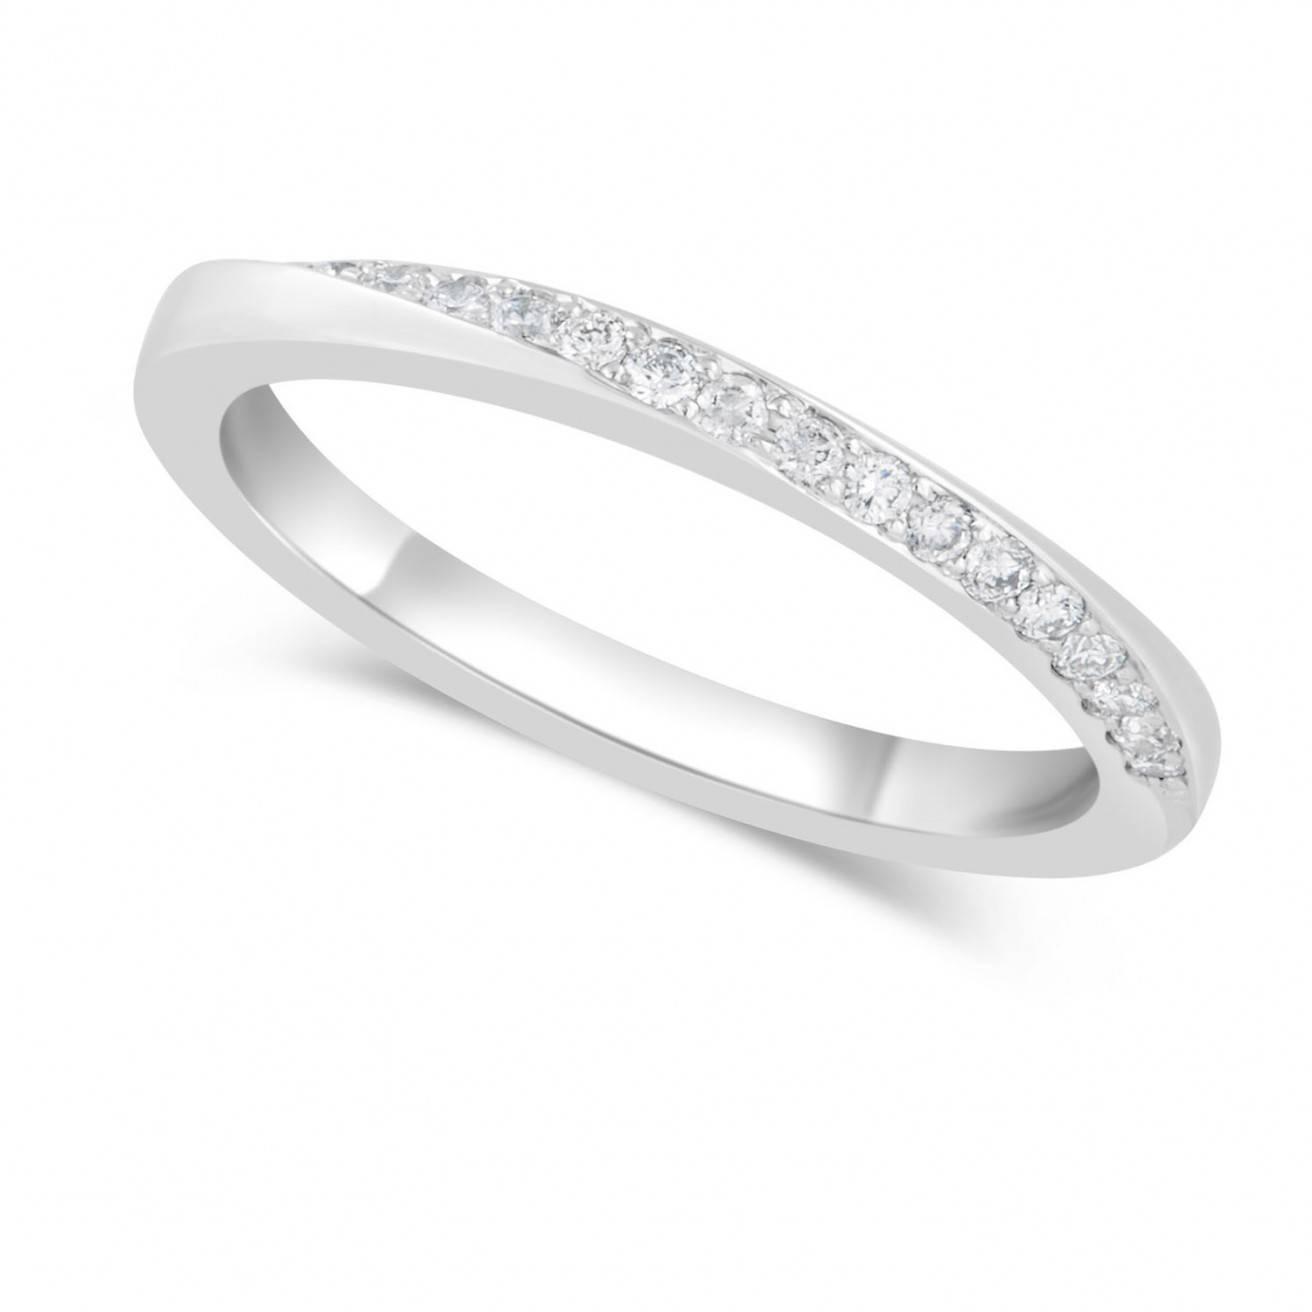 Buy Platinum Wedding Bands Online – Fraser Hart Inside Twisted Diamond Wedding Bands (View 4 of 15)